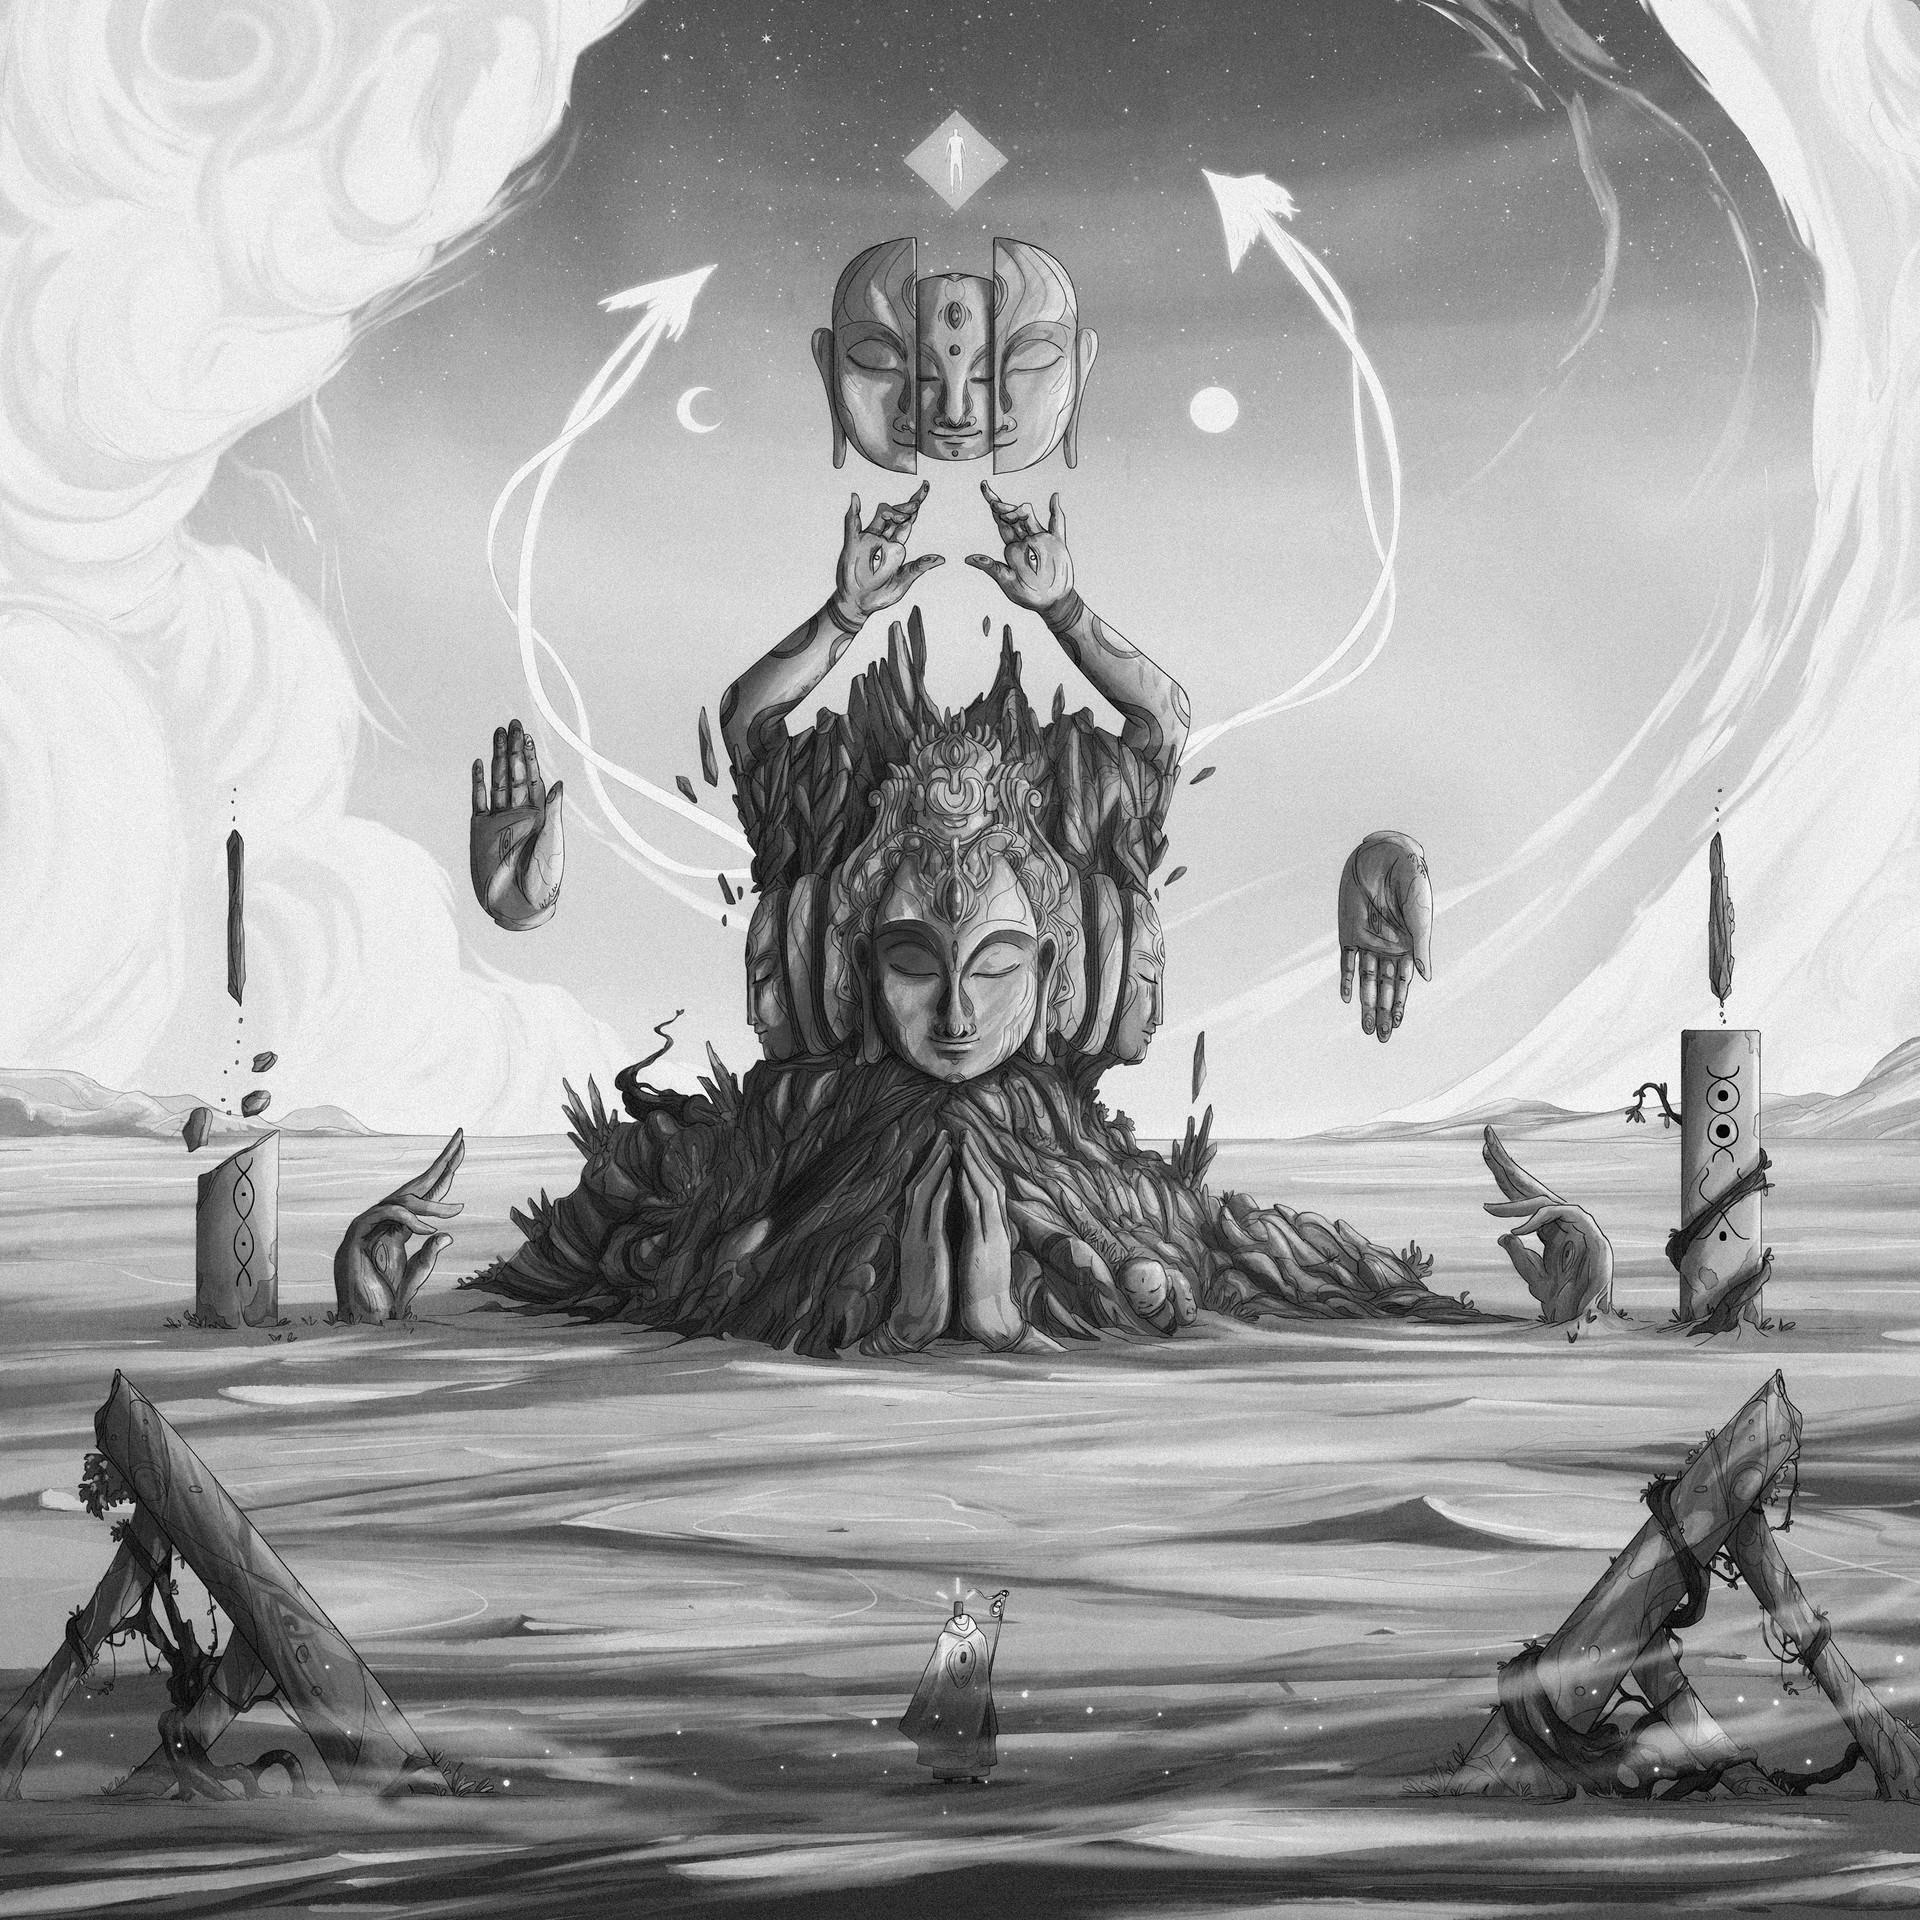 Christian benavides luis portada album art final greyscale